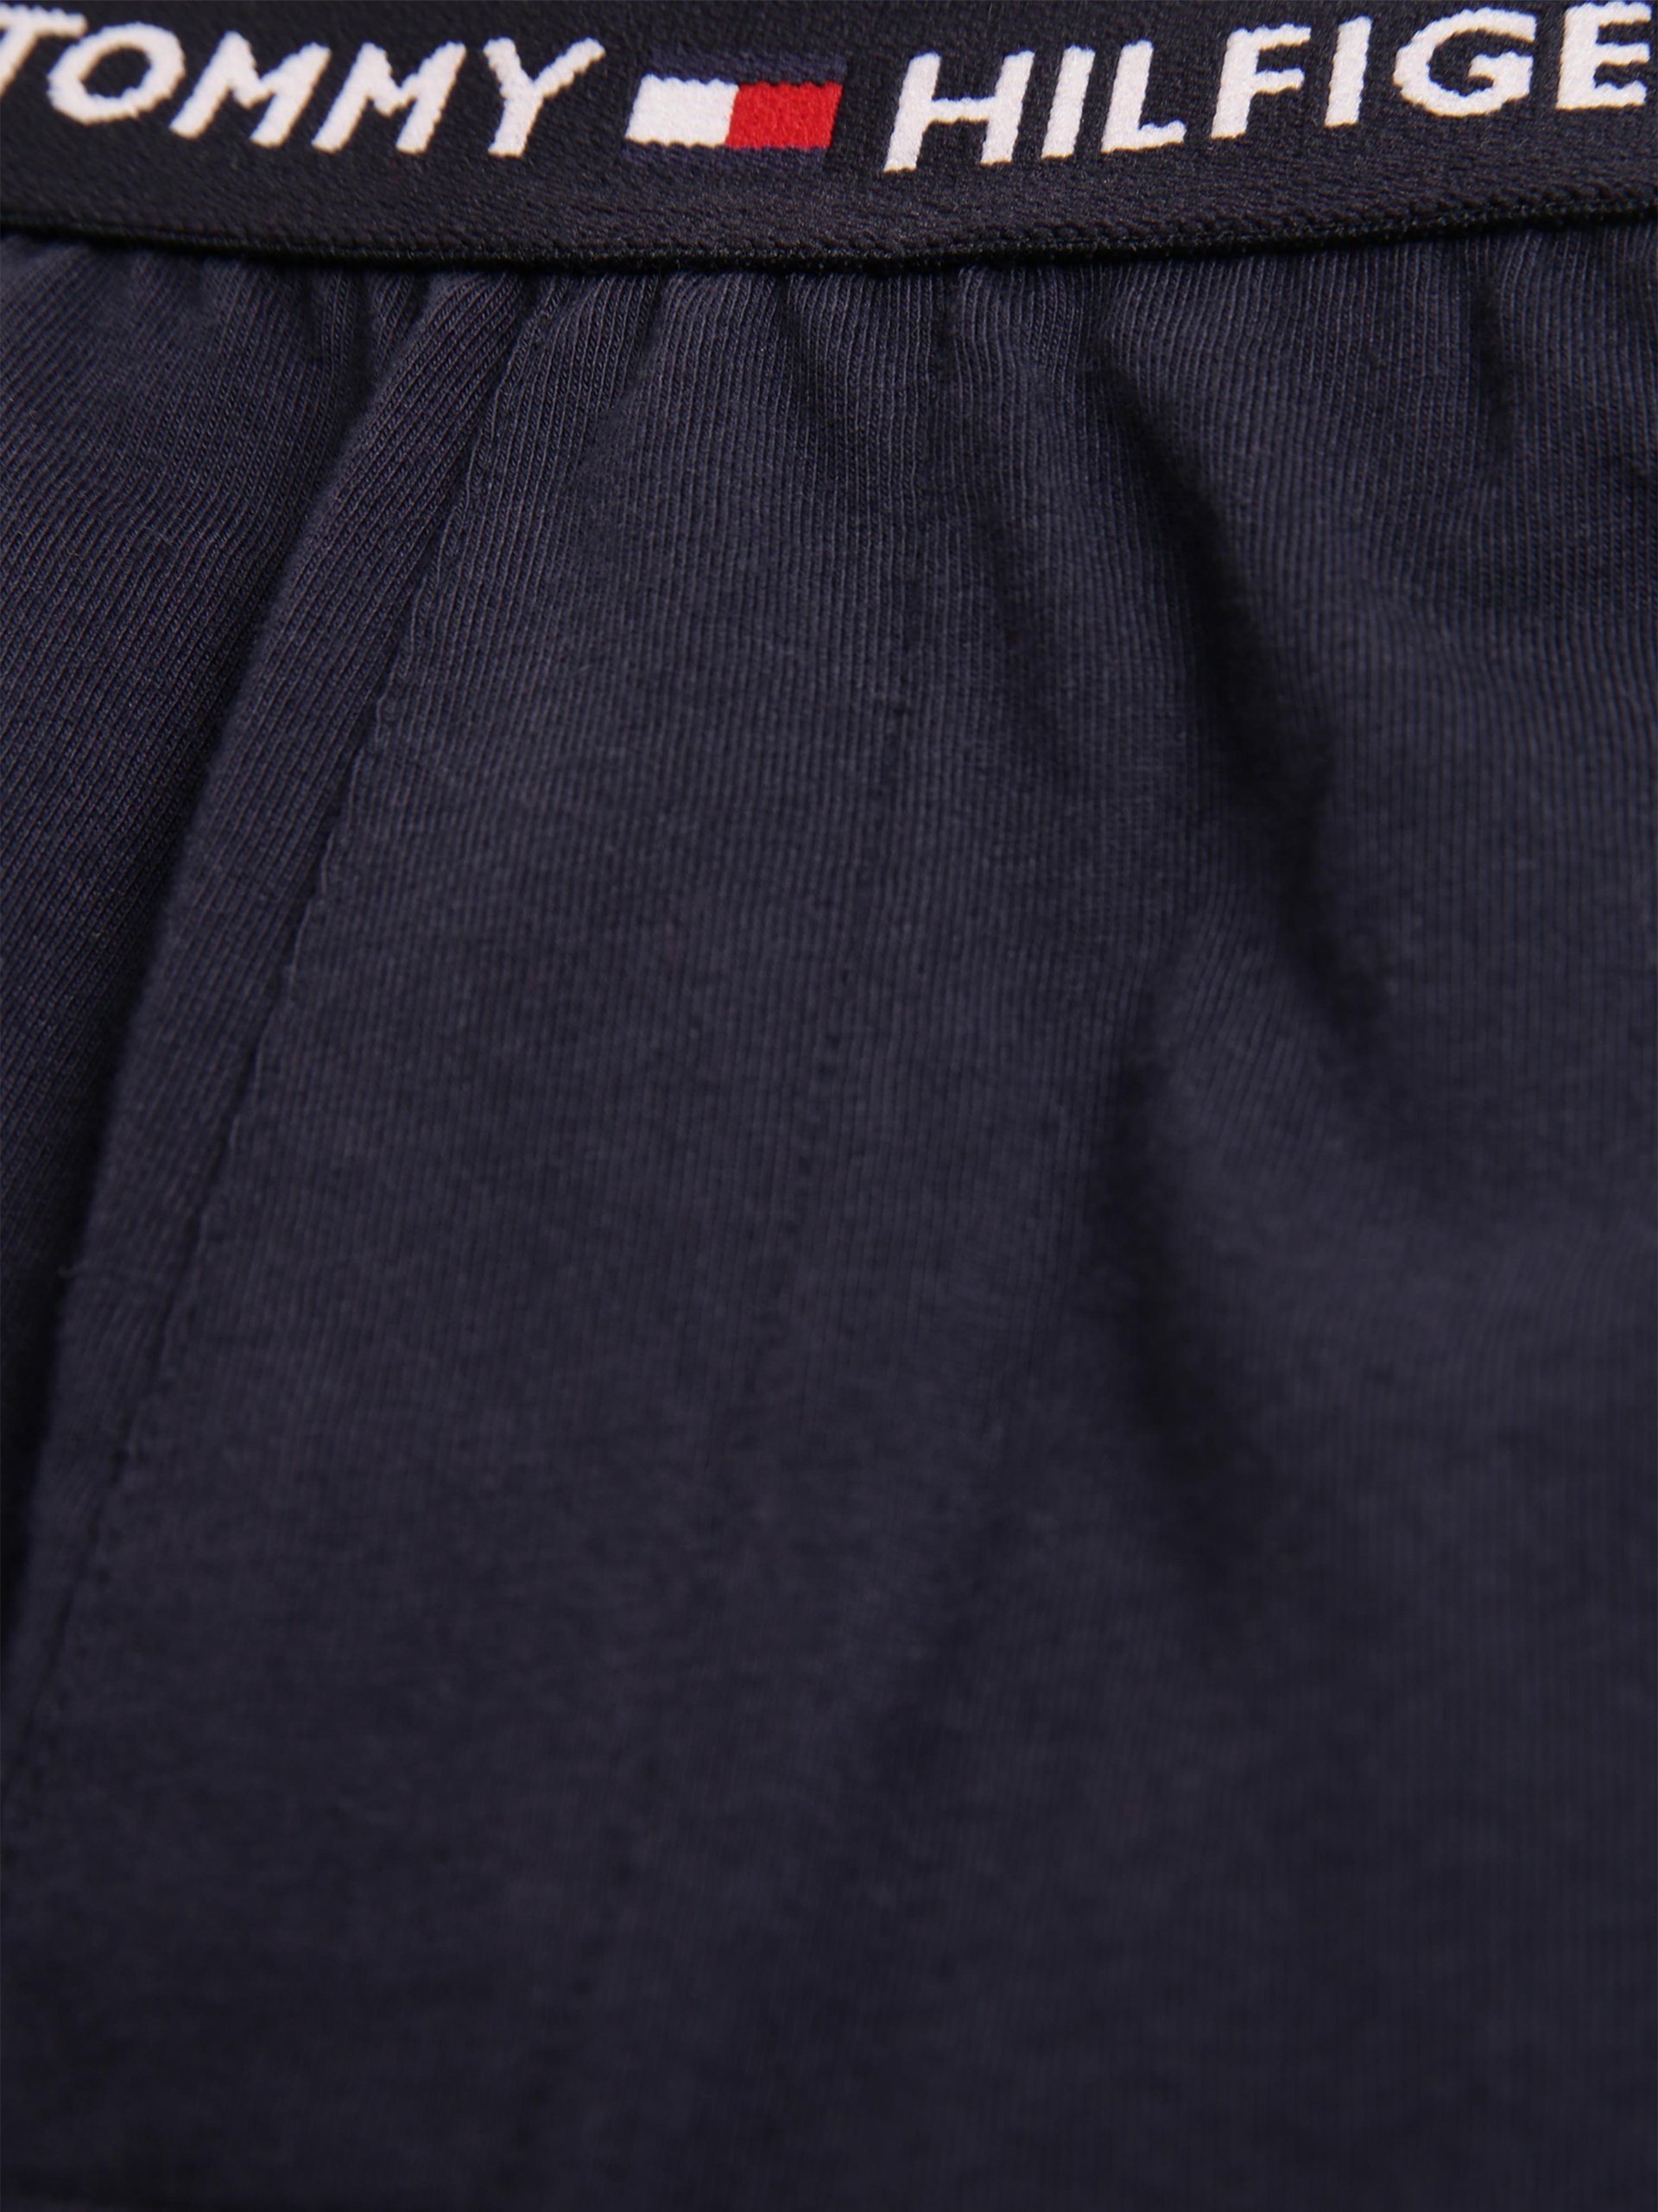 Tommy Hilfiger Herren Pyjama-Shorts